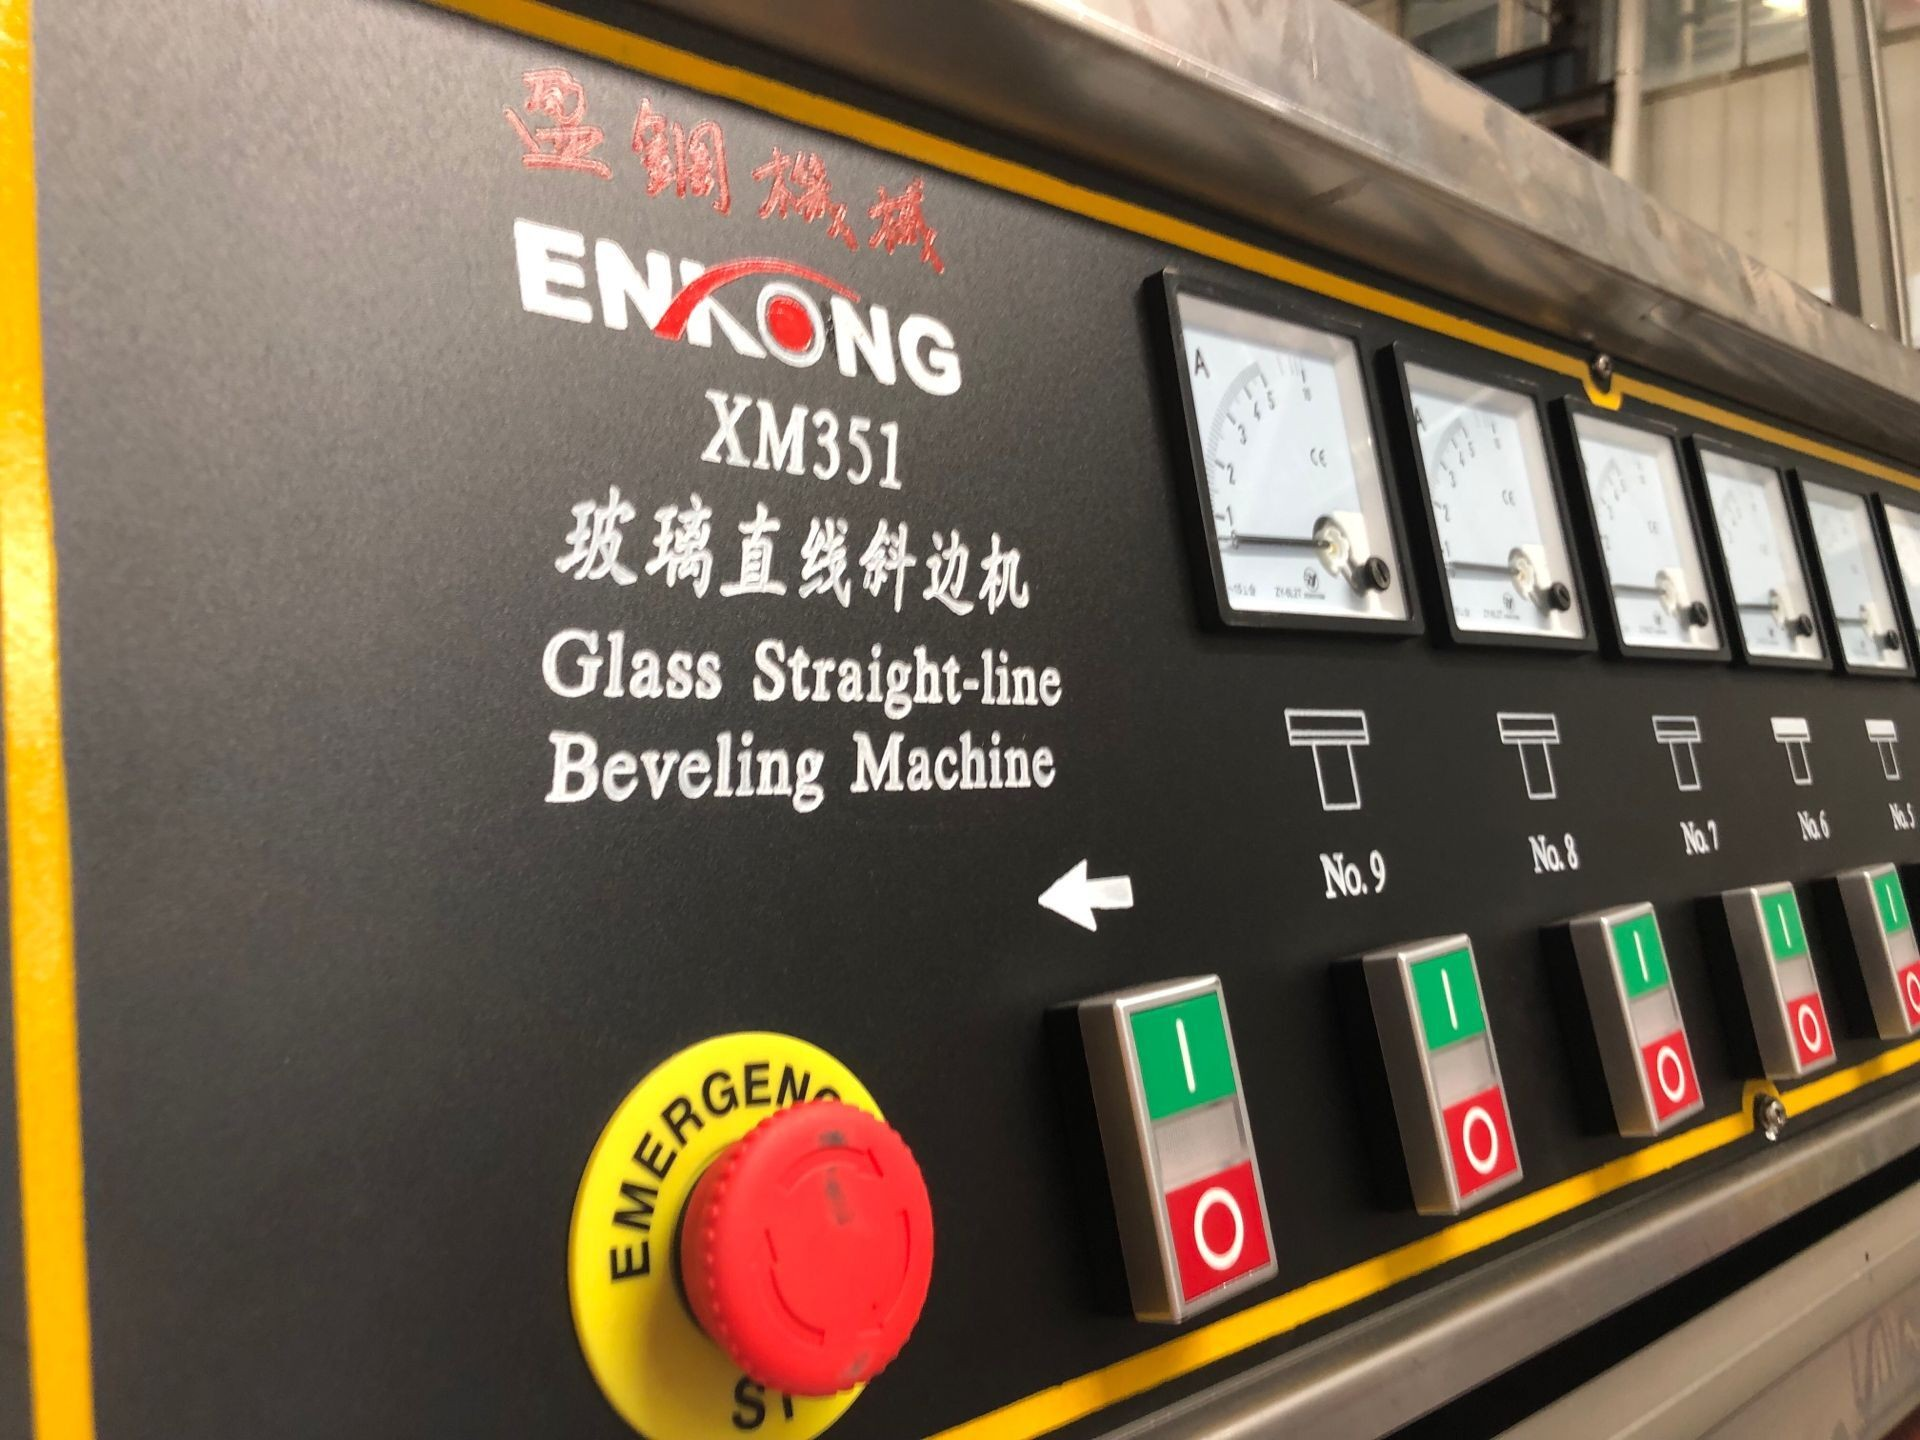 XM351 Glass Straight-line Beveling Machine Manufacturers, XM351 Glass Straight-line Beveling Machine Factory, Supply XM351 Glass Straight-line Beveling Machine